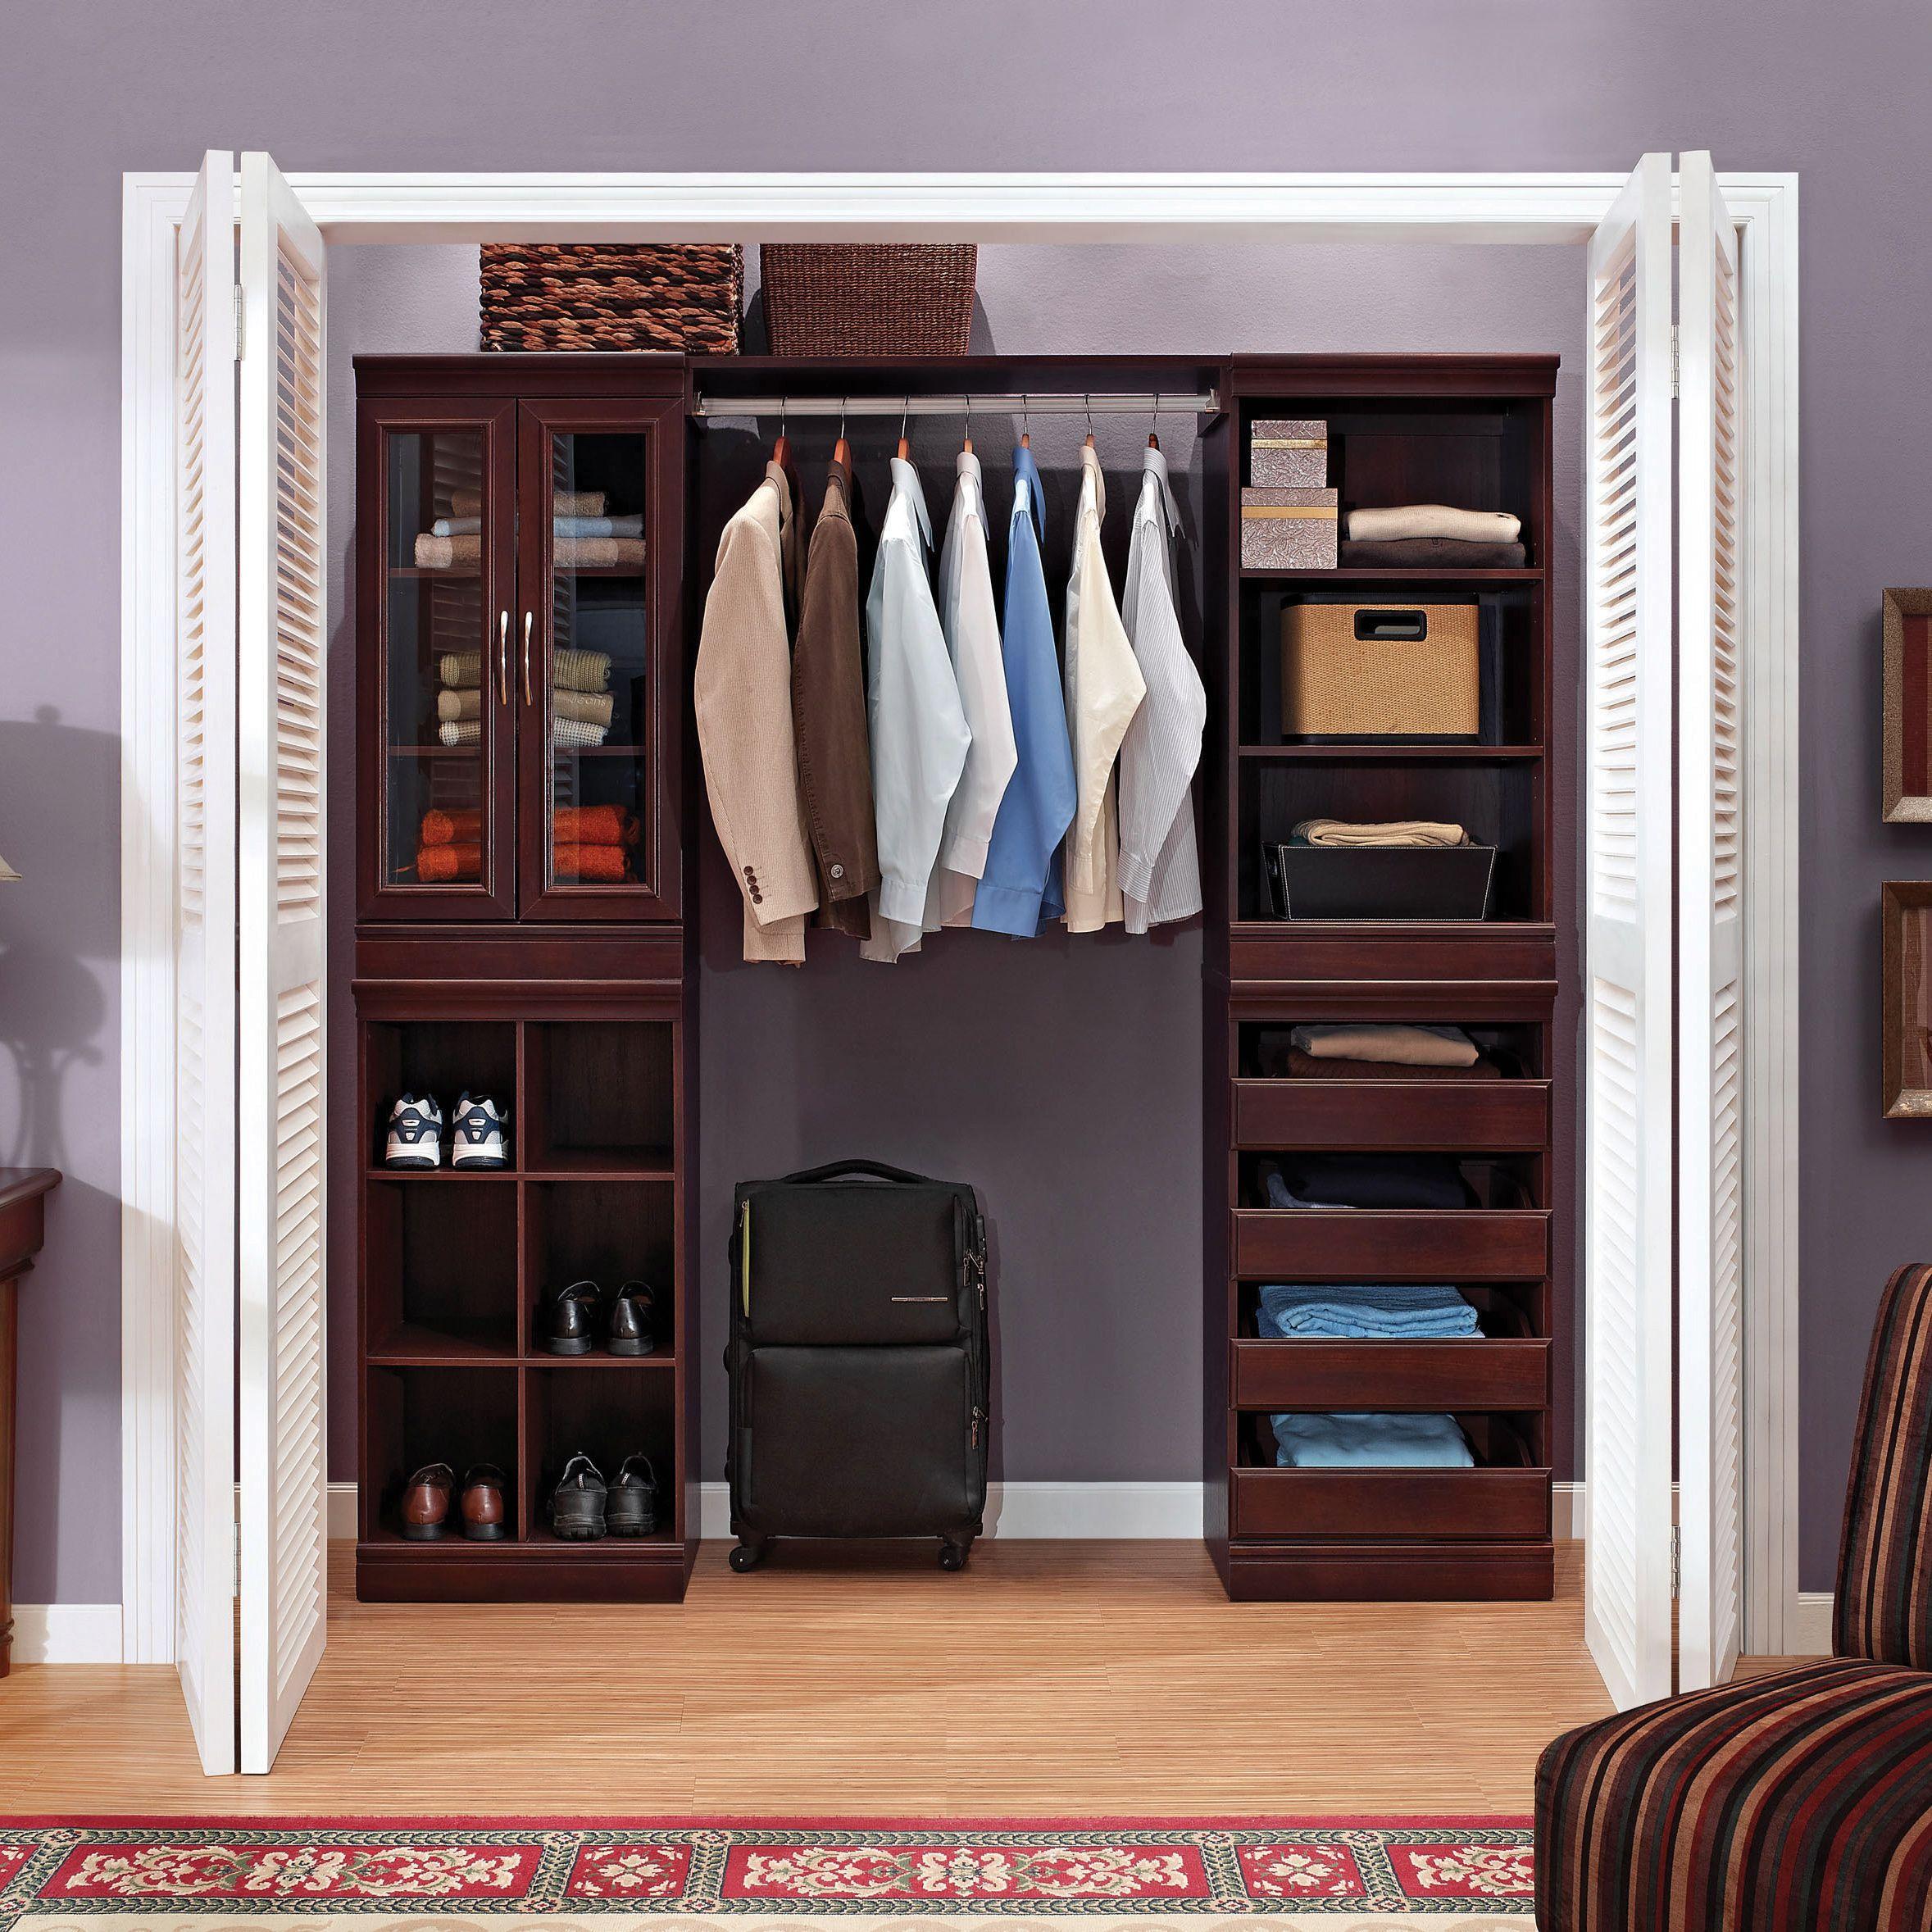 The Whalen Storage Closet Organization System is an ideal